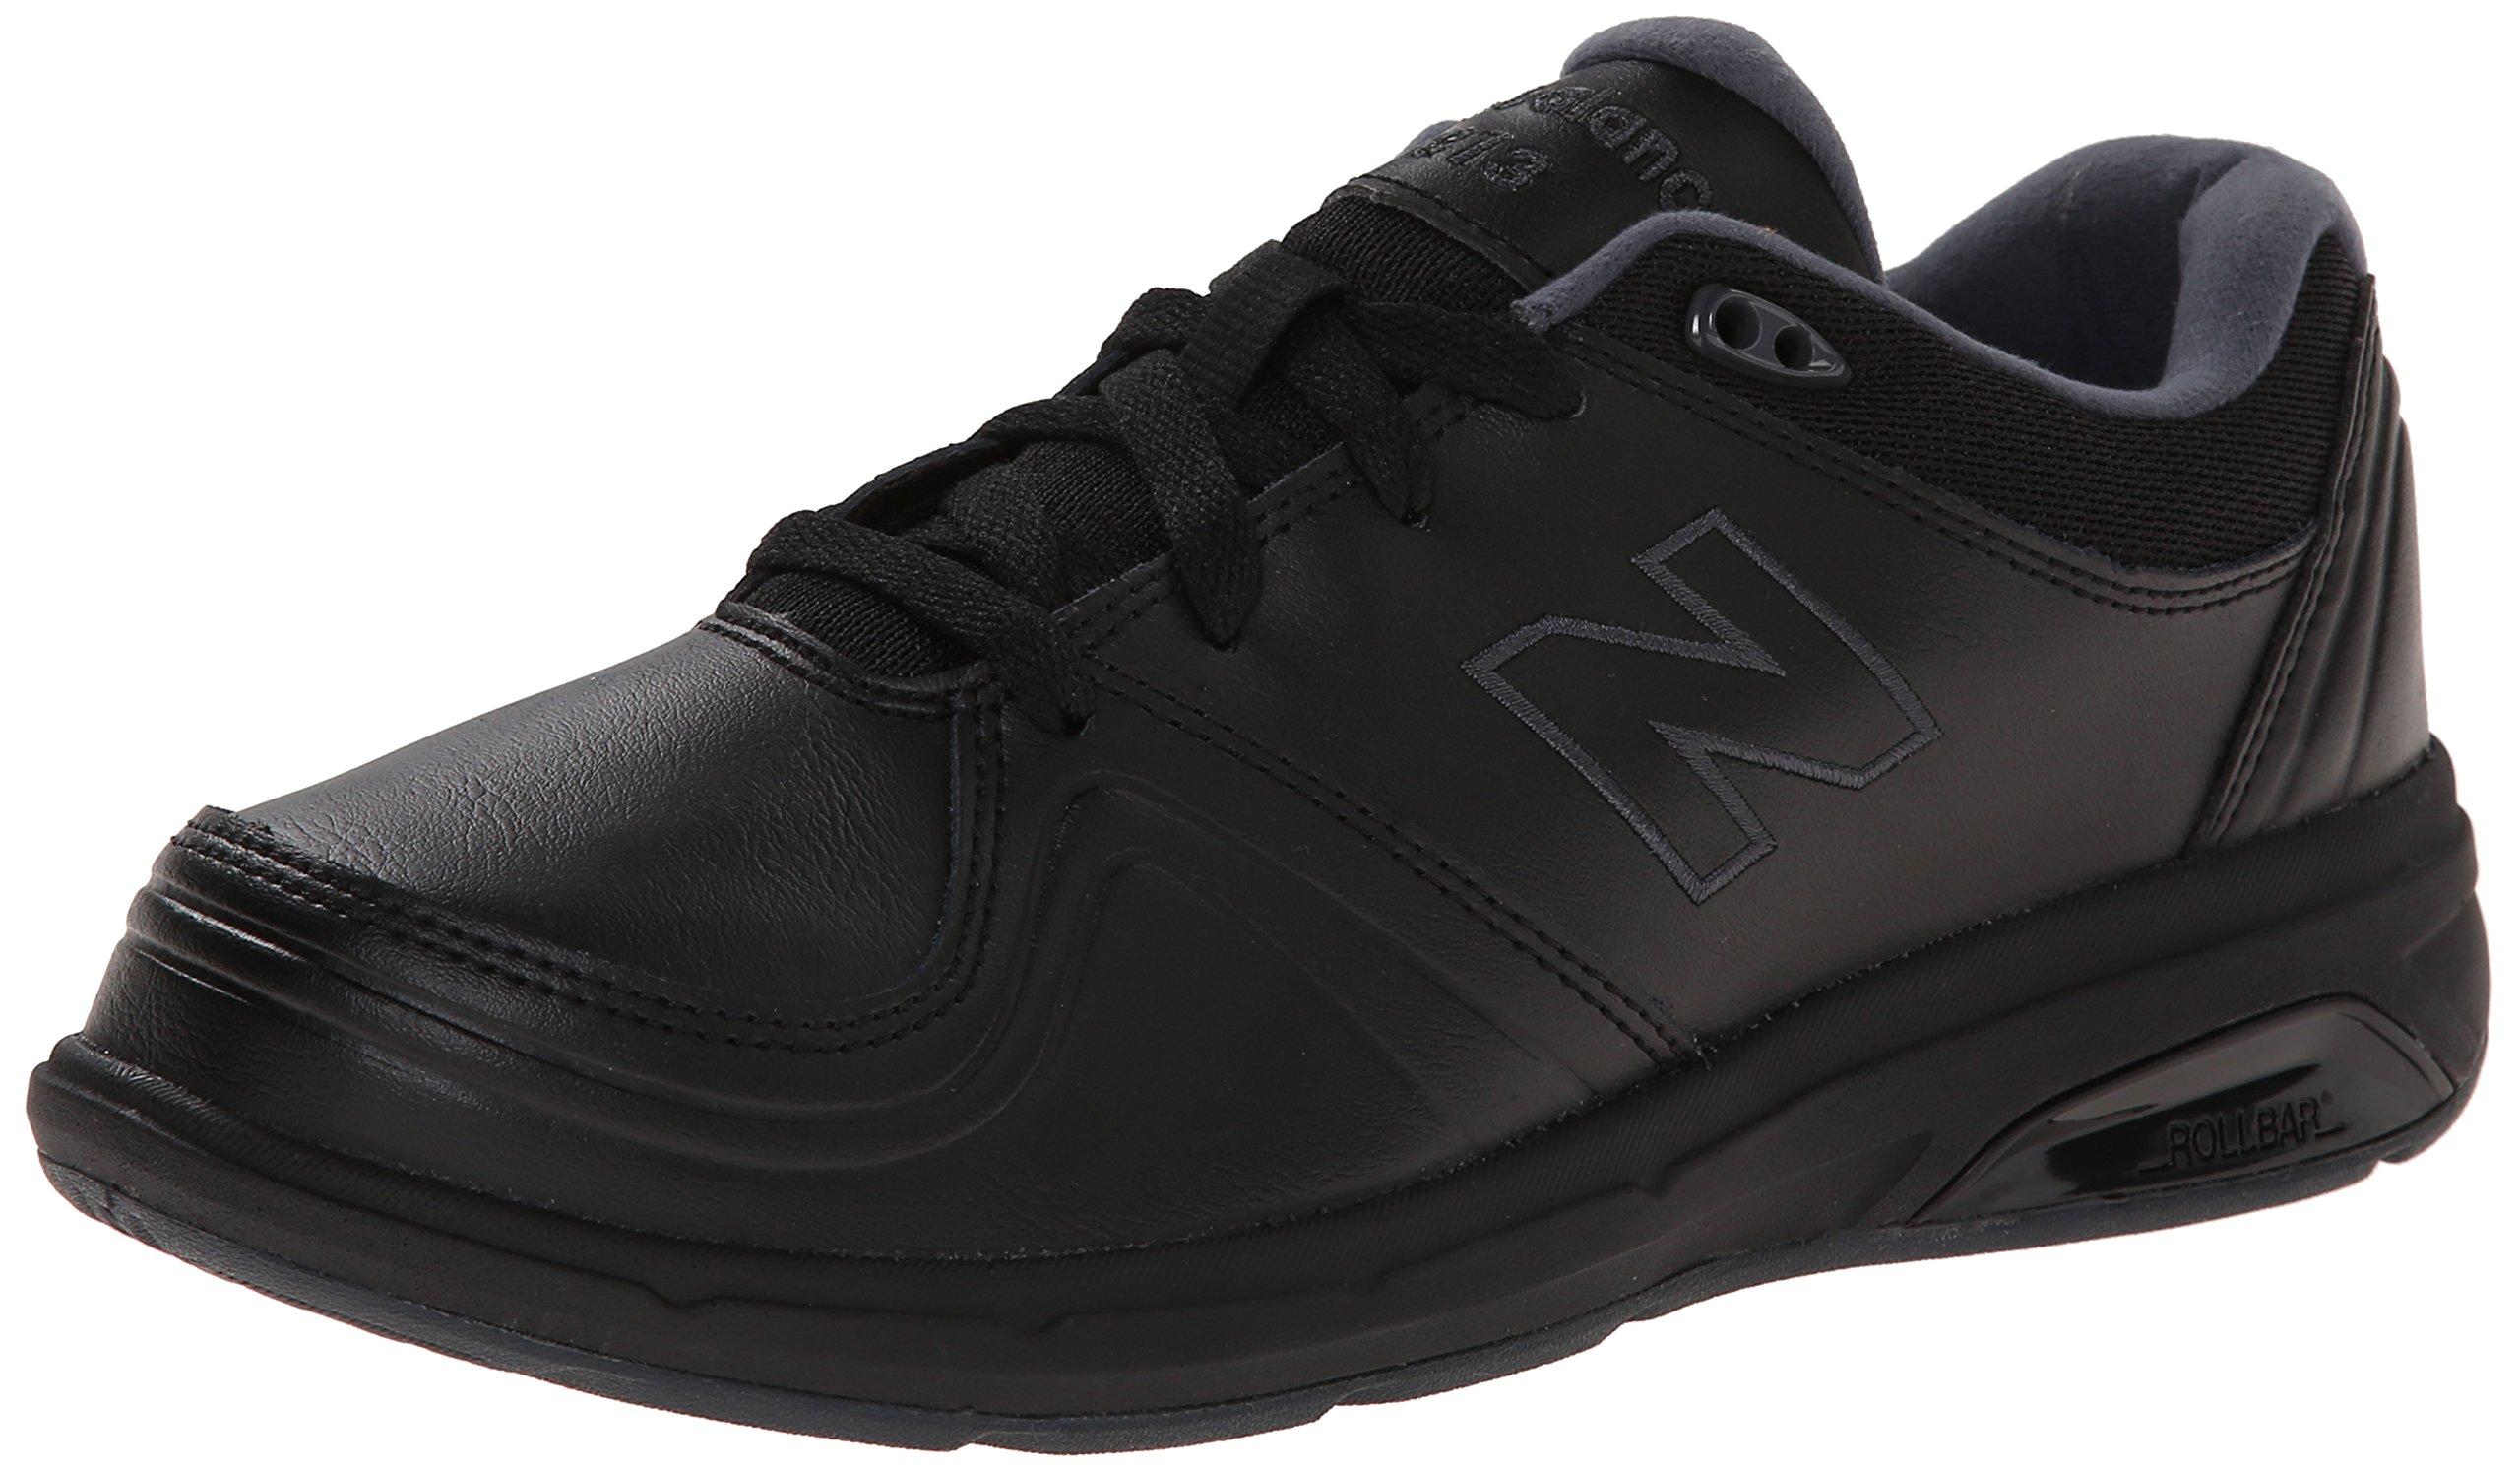 New Balance Women's WW813 Walking Shoe, Black, 8.5 2E US